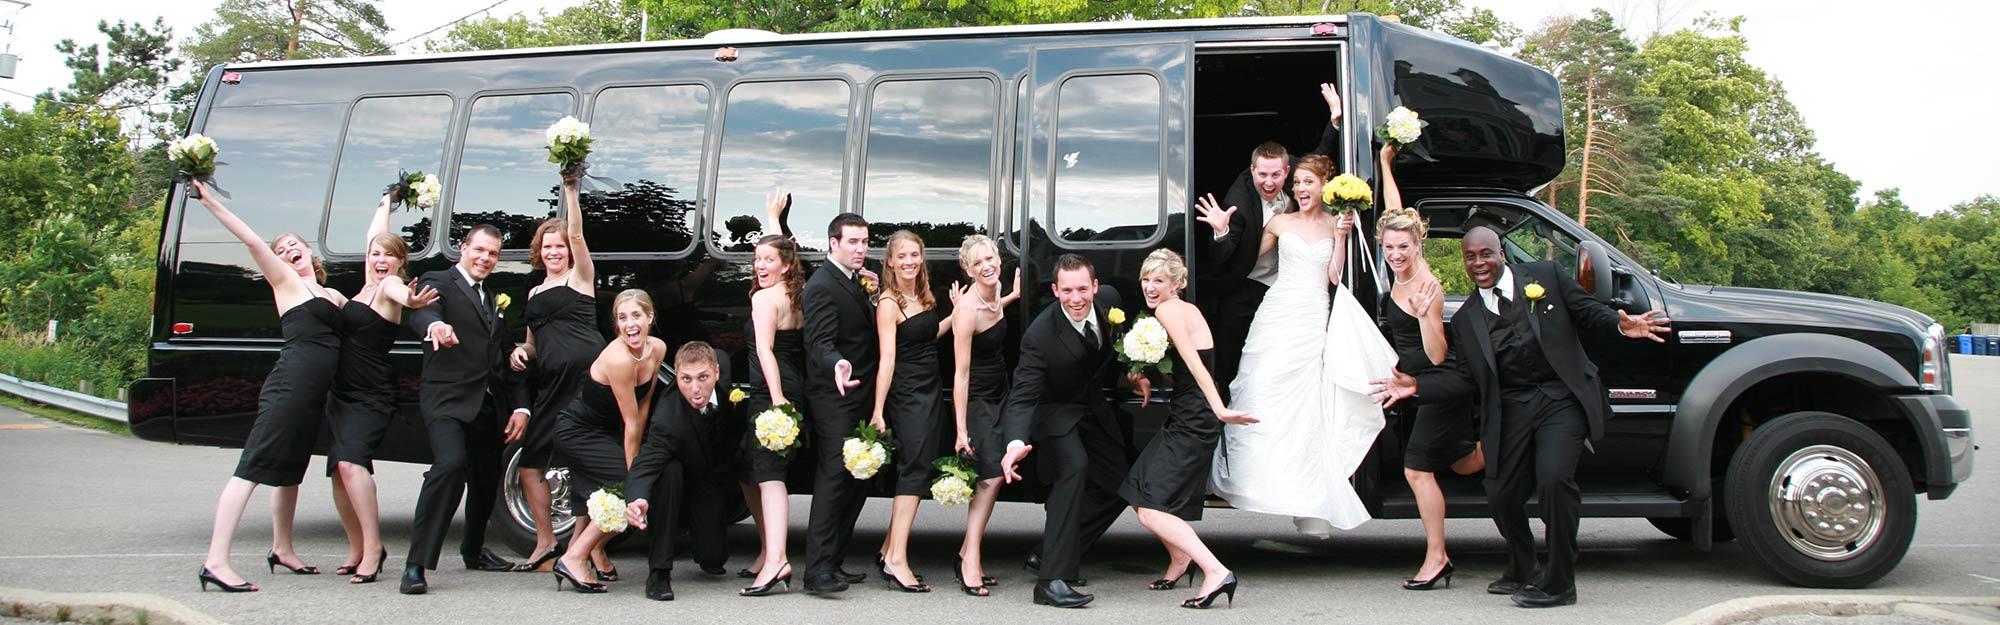 Wedding Limobus Limbusine